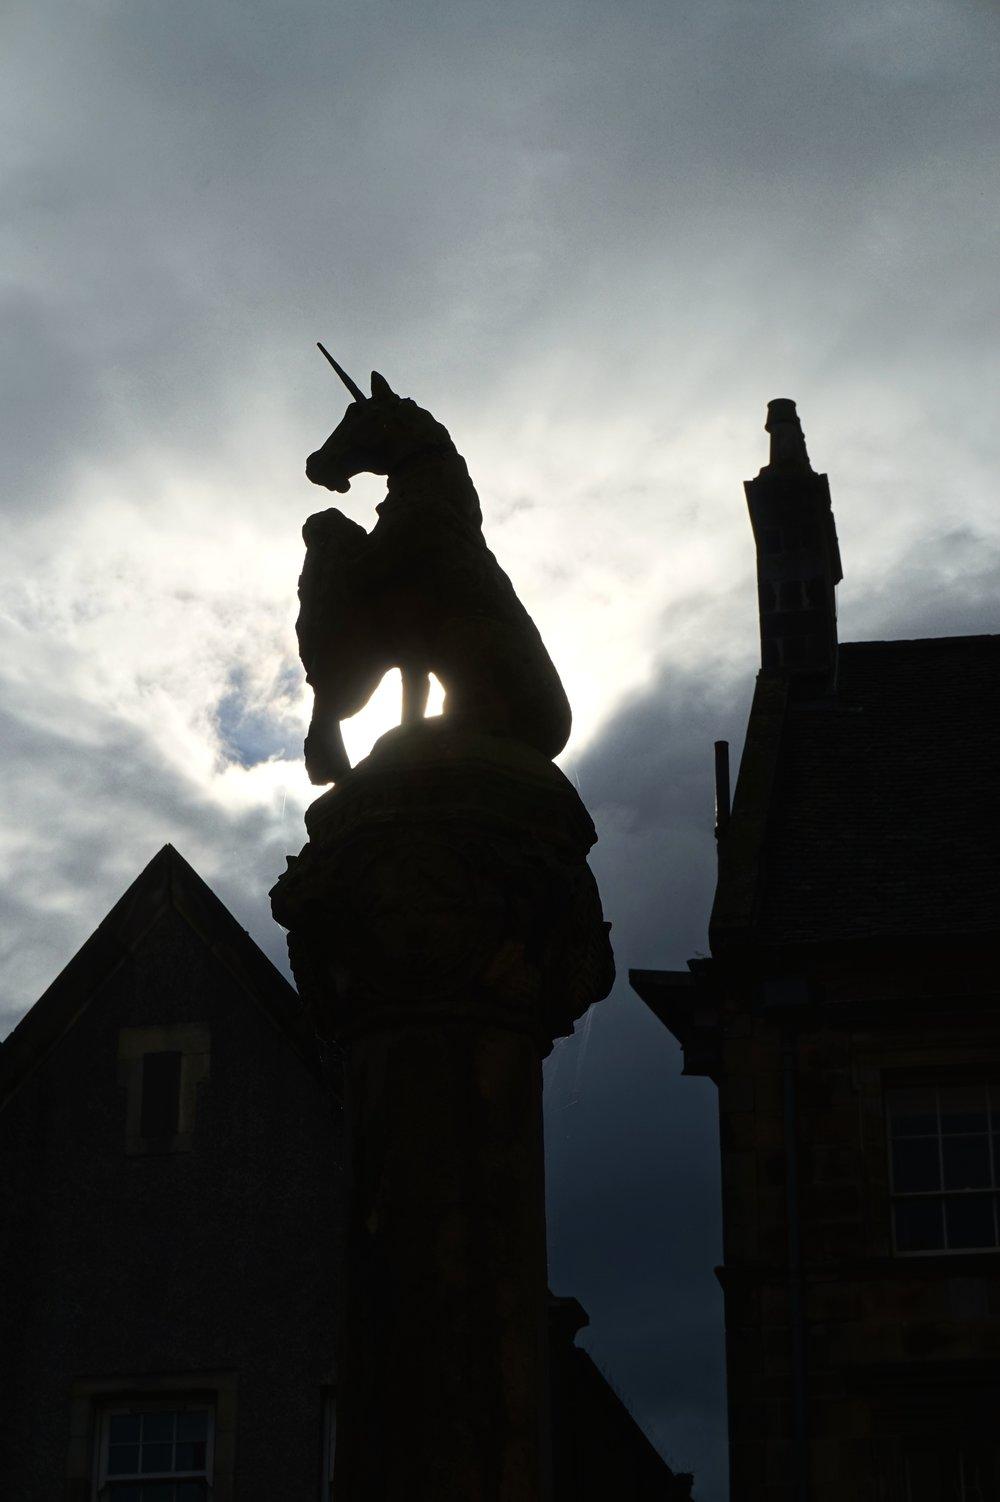 The Unicorn in the Merket Square